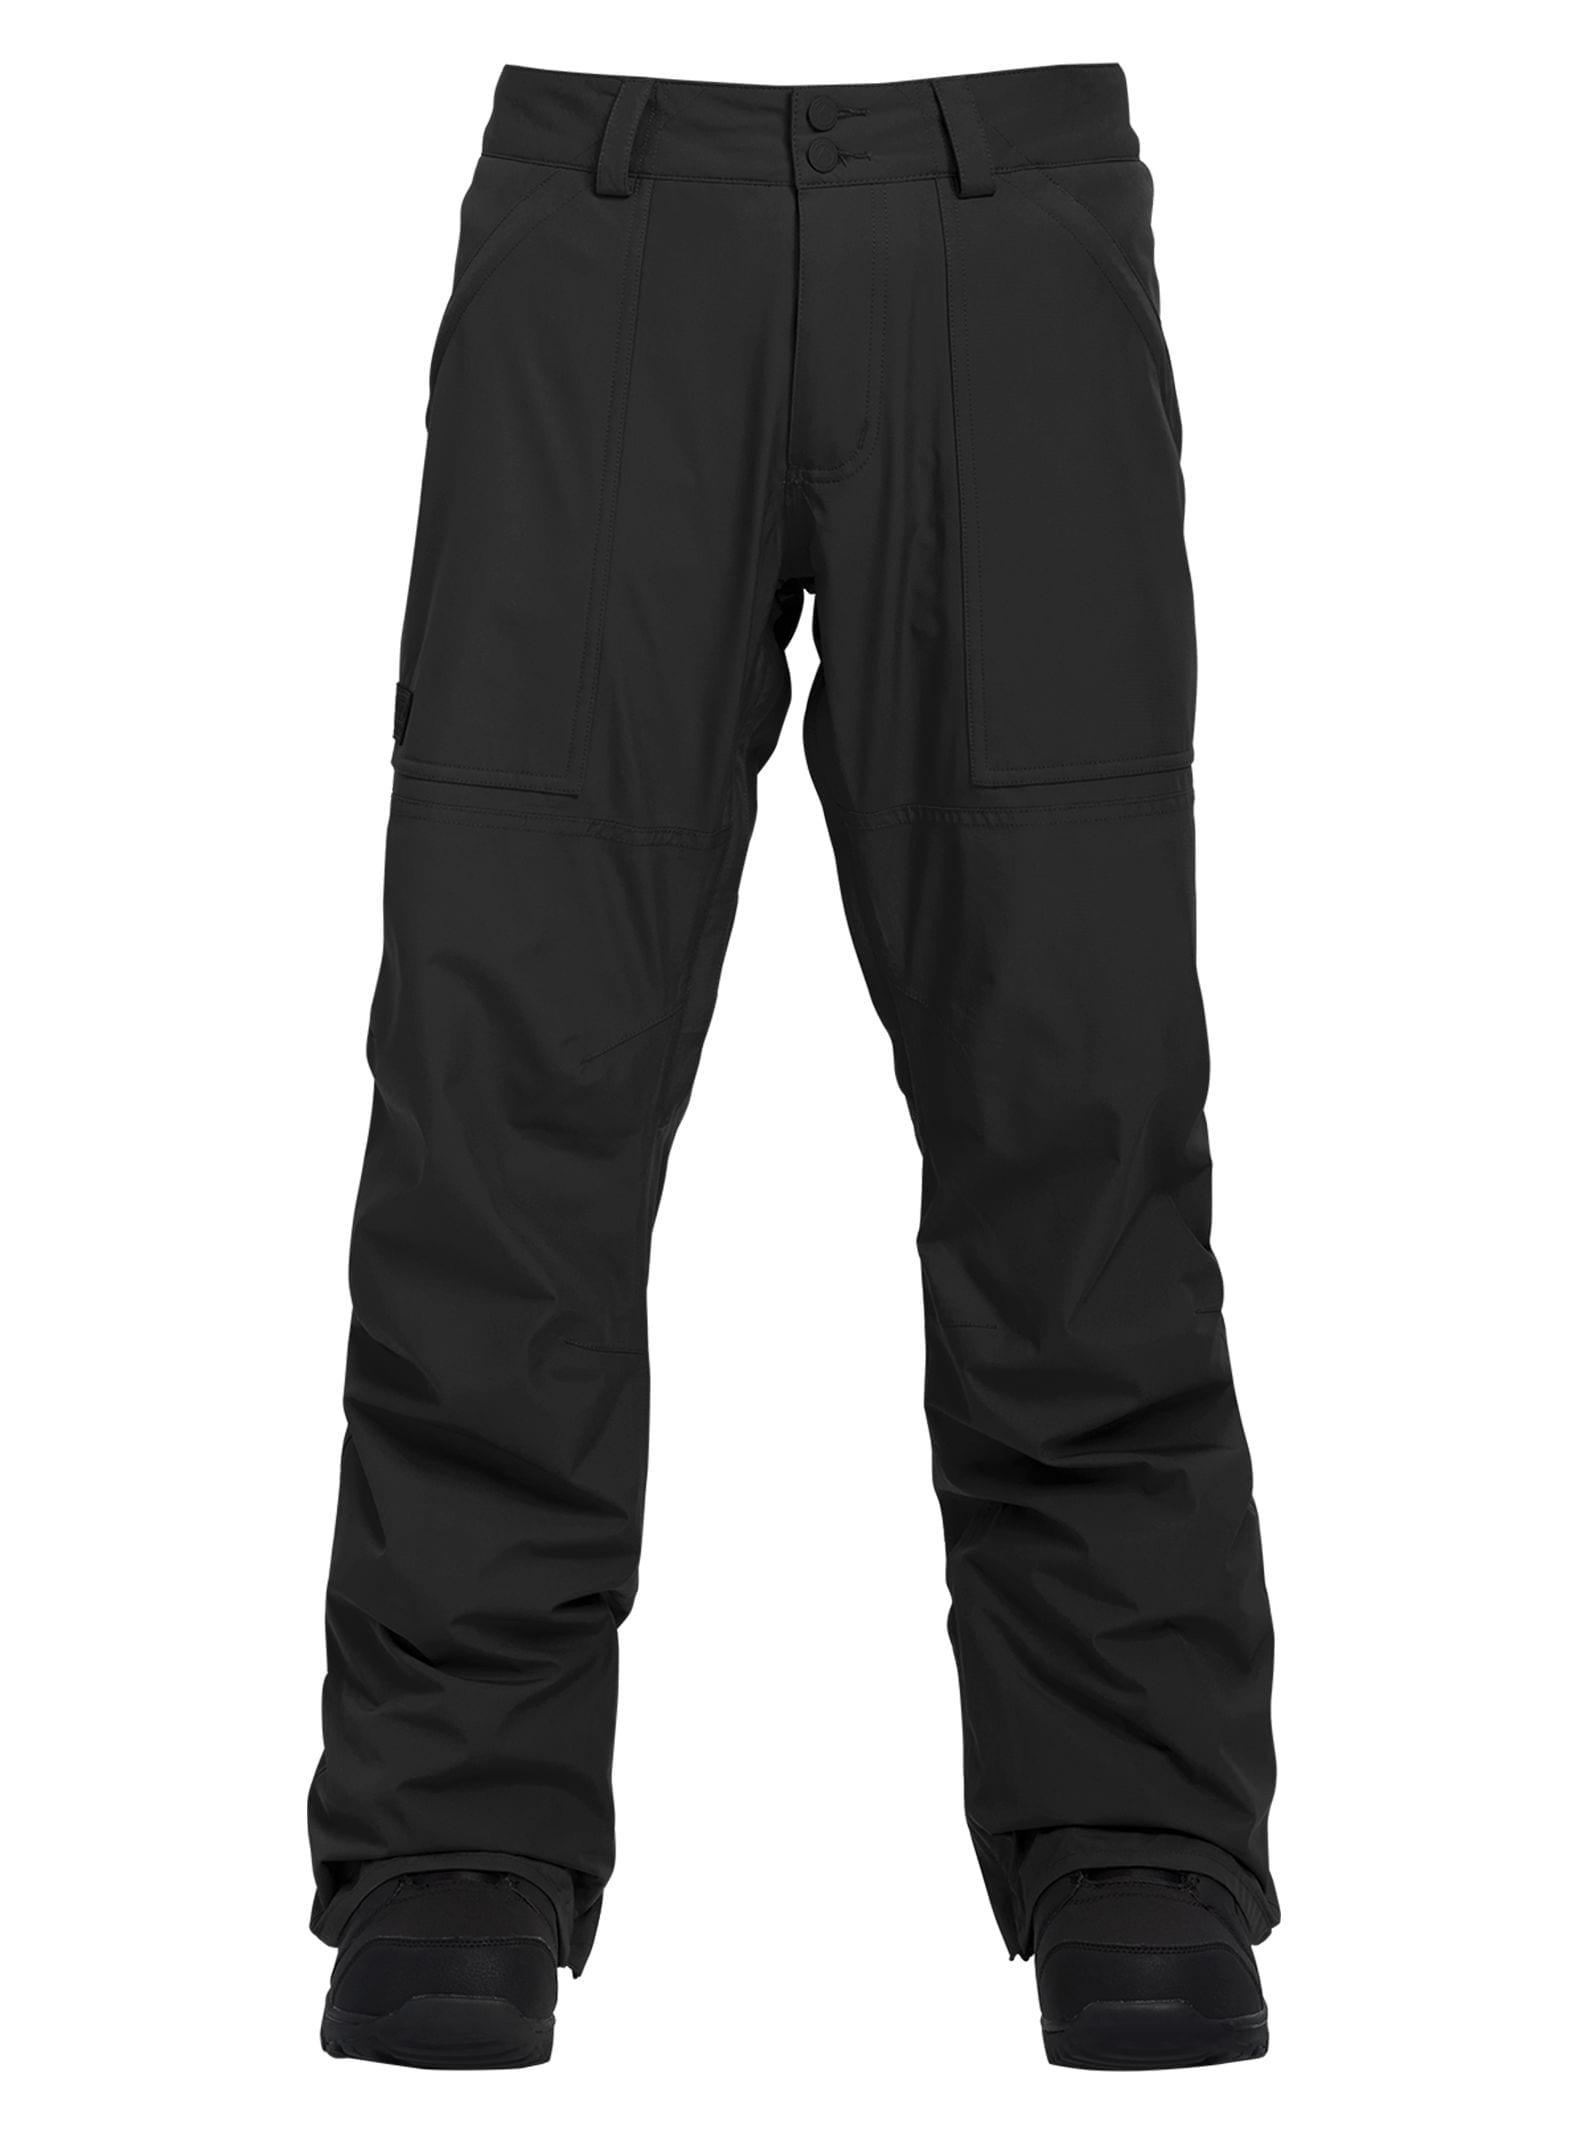 Men_s Burton Gore Ballast Pant, Black, 209.99